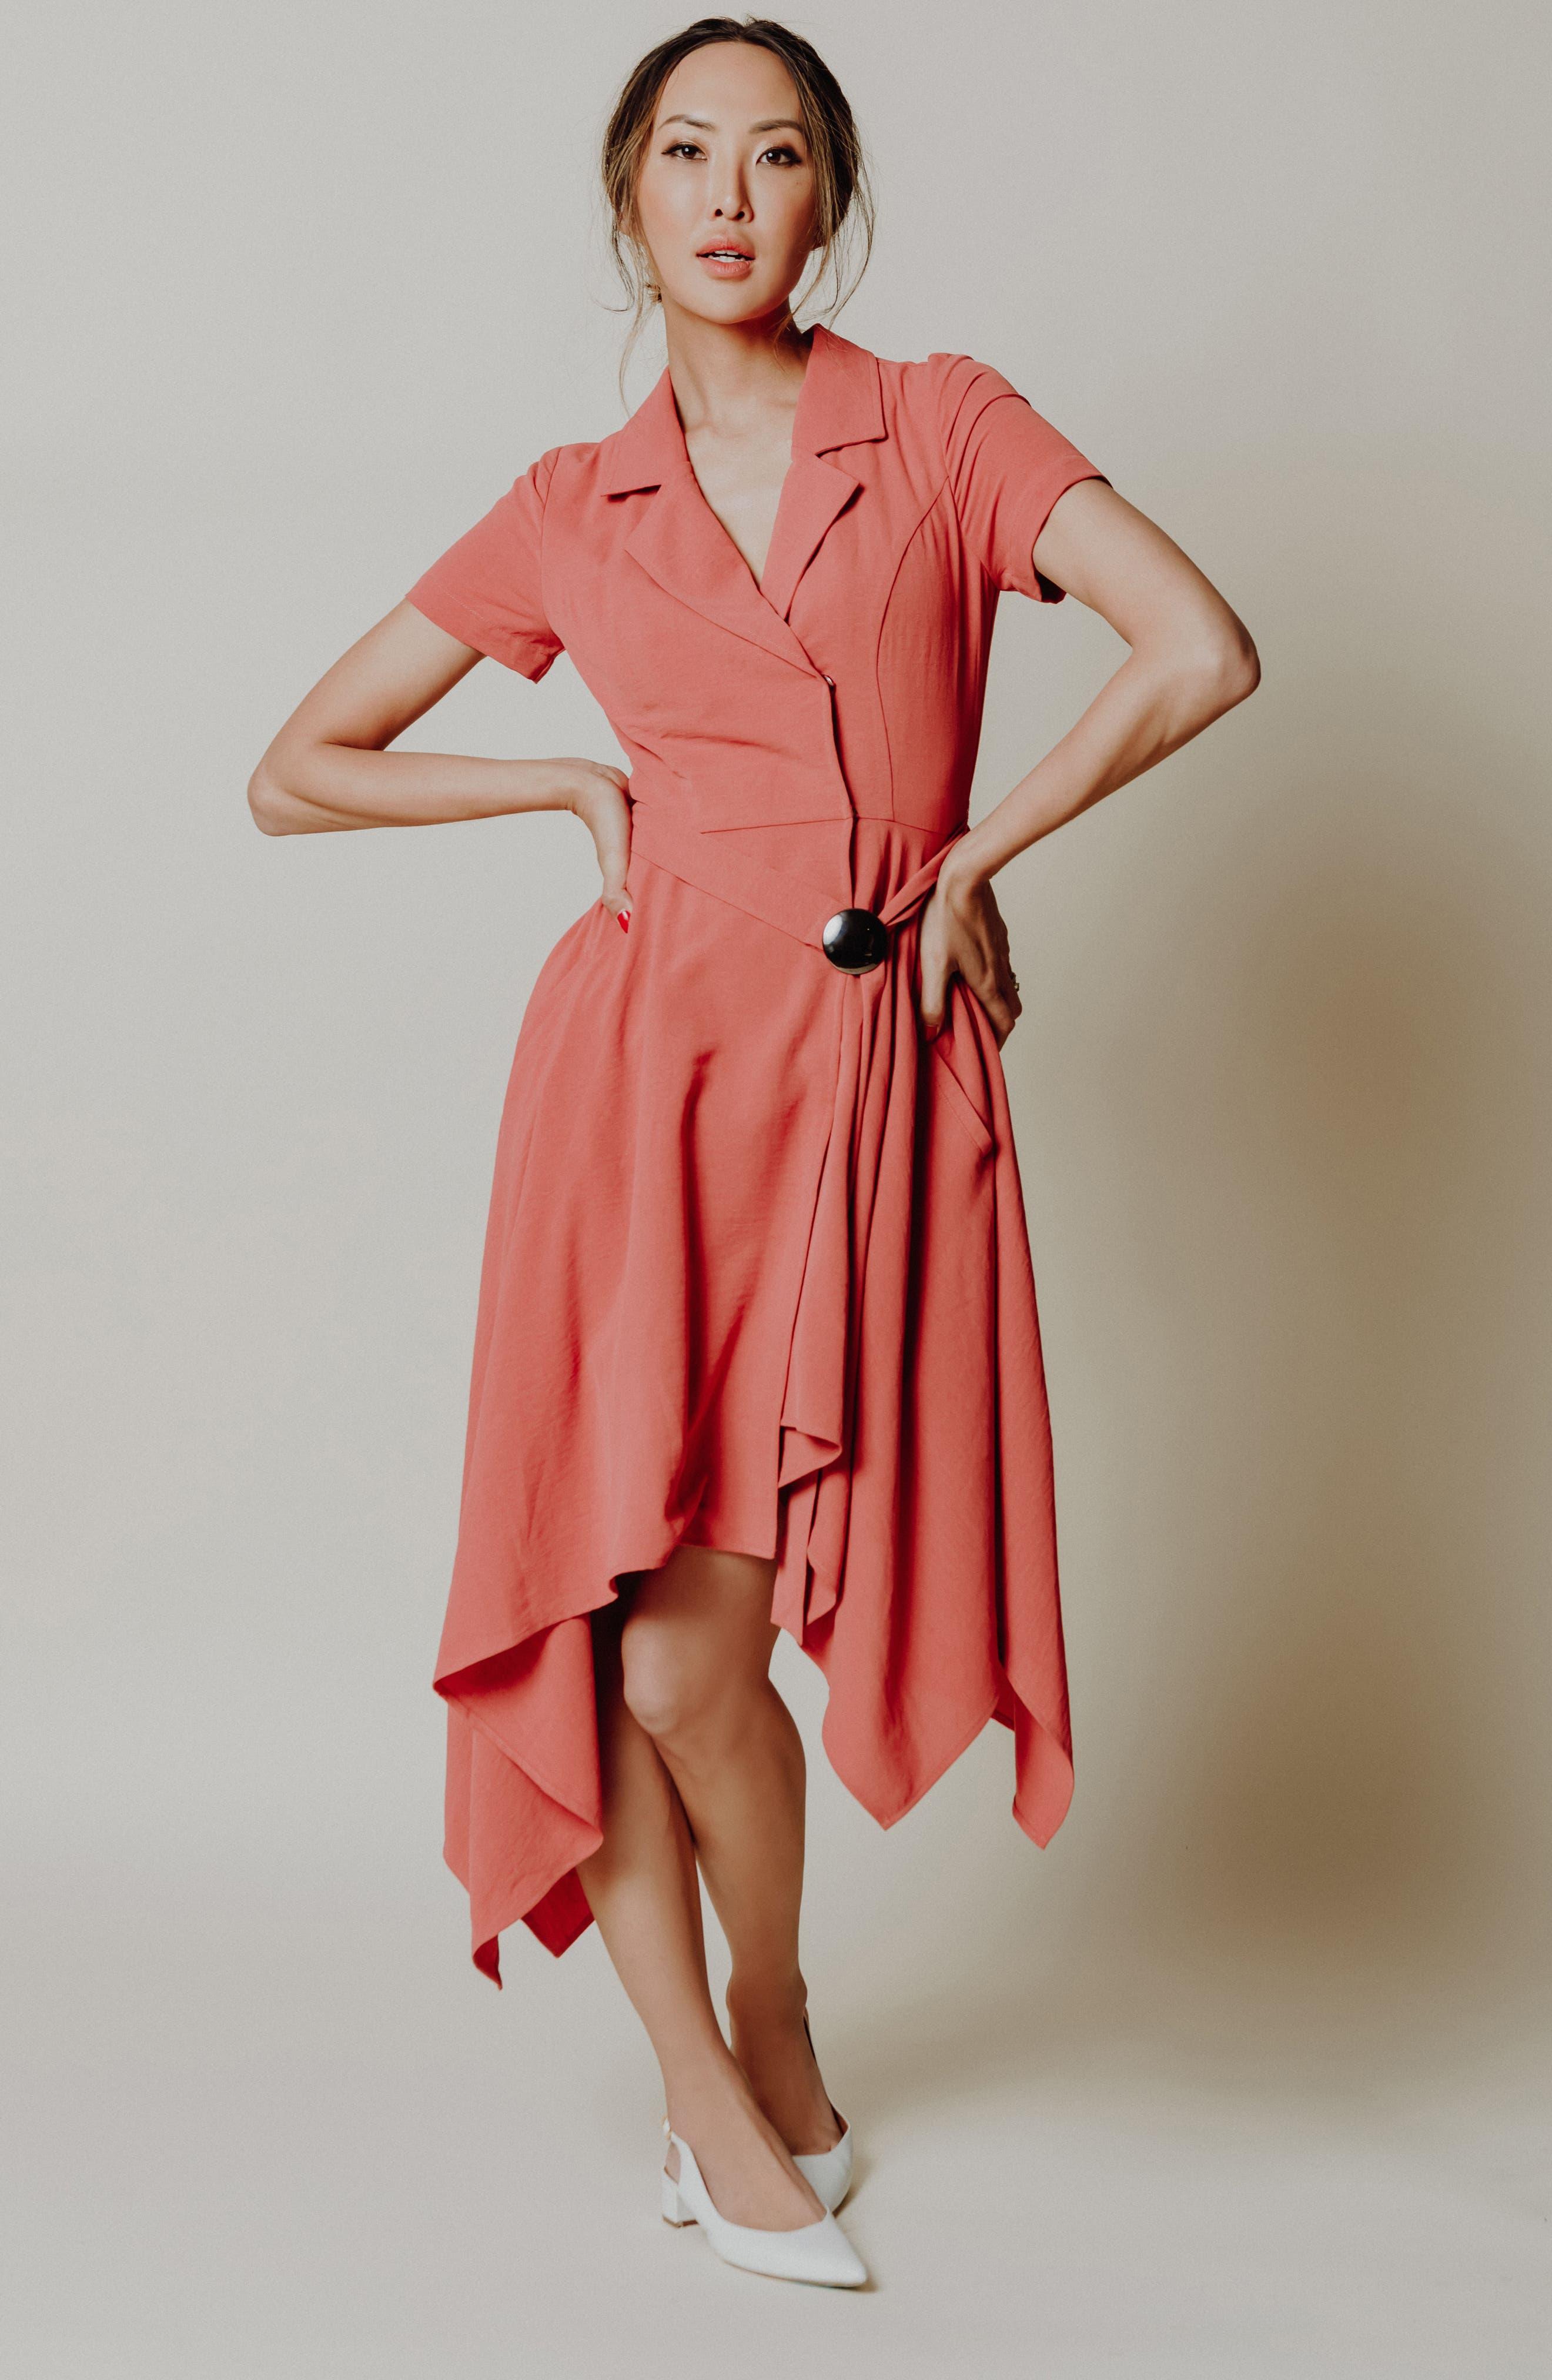 Chriselle x J.O.A. Asymmetrical Trench Dress,                             Alternate thumbnail 10, color,                             Patina